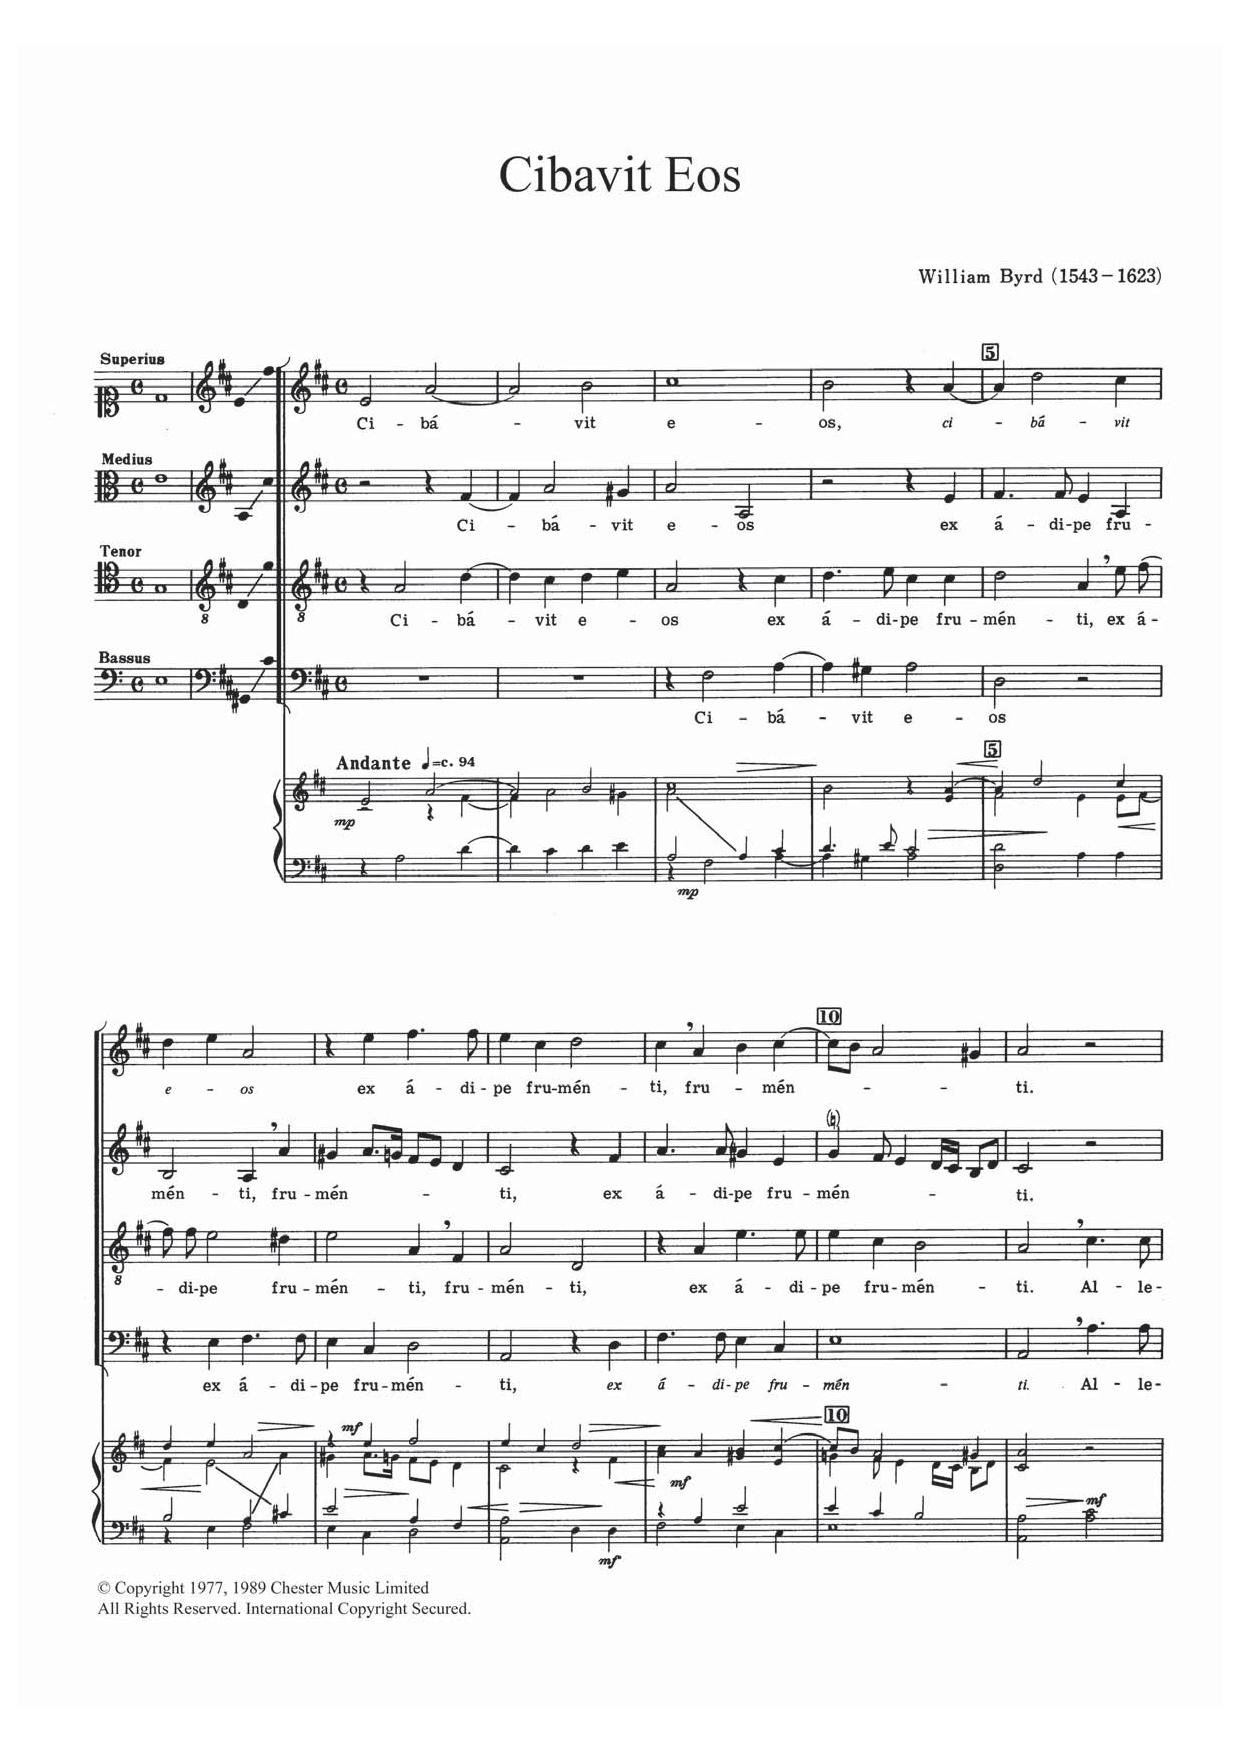 Cibavit Eos Sheet Music